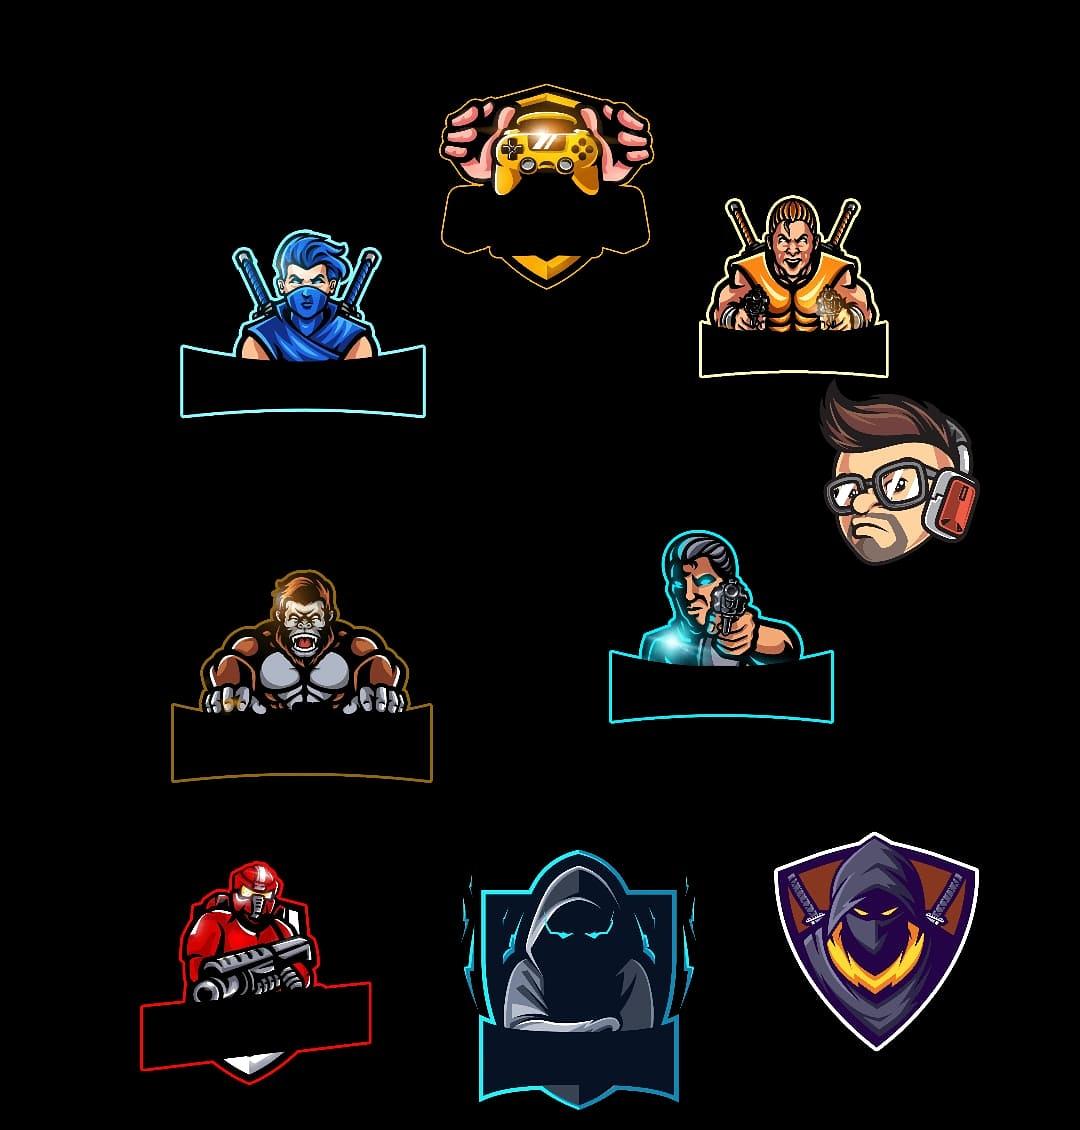 Wer will Ein Logo who Needs A Logo #gaming #ps4 #gamer #videogames #fortnitememes #fortnitebattleroyale #pubg #cod #playstation #xbox #memes #fortniteclips #lol #fortnitebr #fortnitecommunity #funny #gamergirl #meme #fortnitegame #callofduty #fortnitememe #games #fortnitesolopic.twitter.com/f4syUX2kva